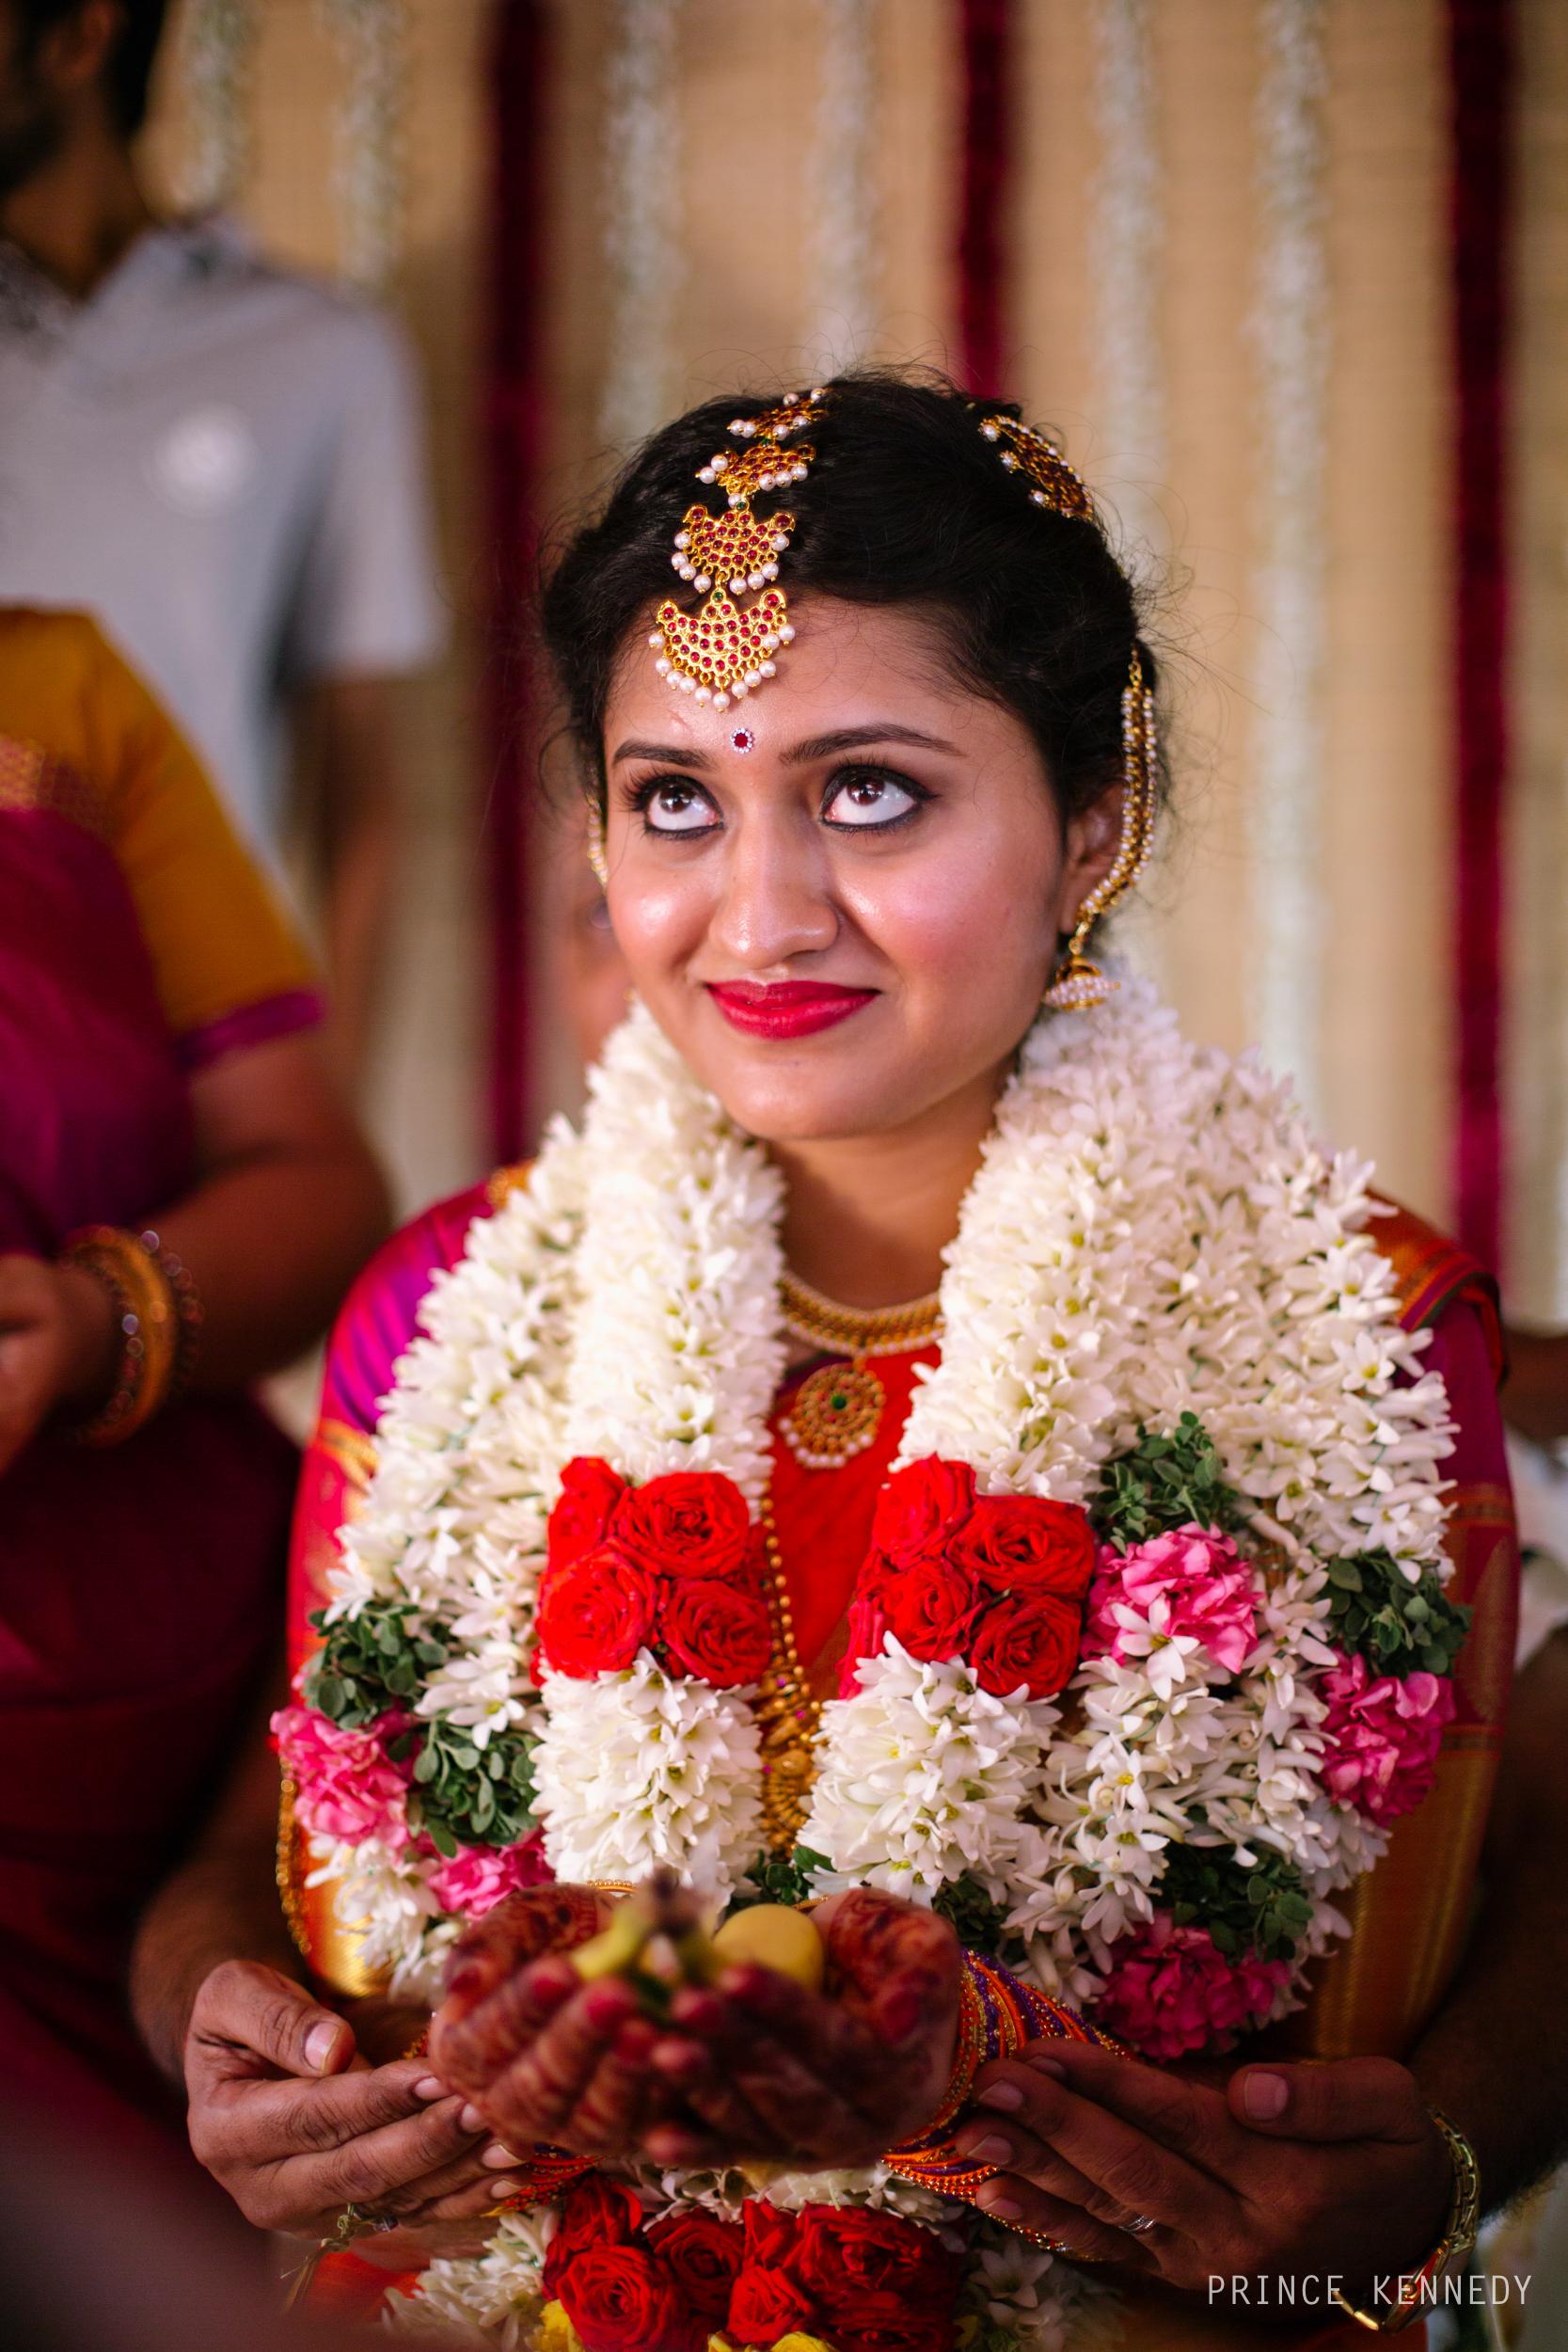 Athmajja-Nithesh-Engagement-Couple-Portrait-Portraiture-Wedding-Couple-Portrait-Chennai-Photographer-Candid-Photography-Destination-Best-Prince-Kennedy-Photography-218.jpg